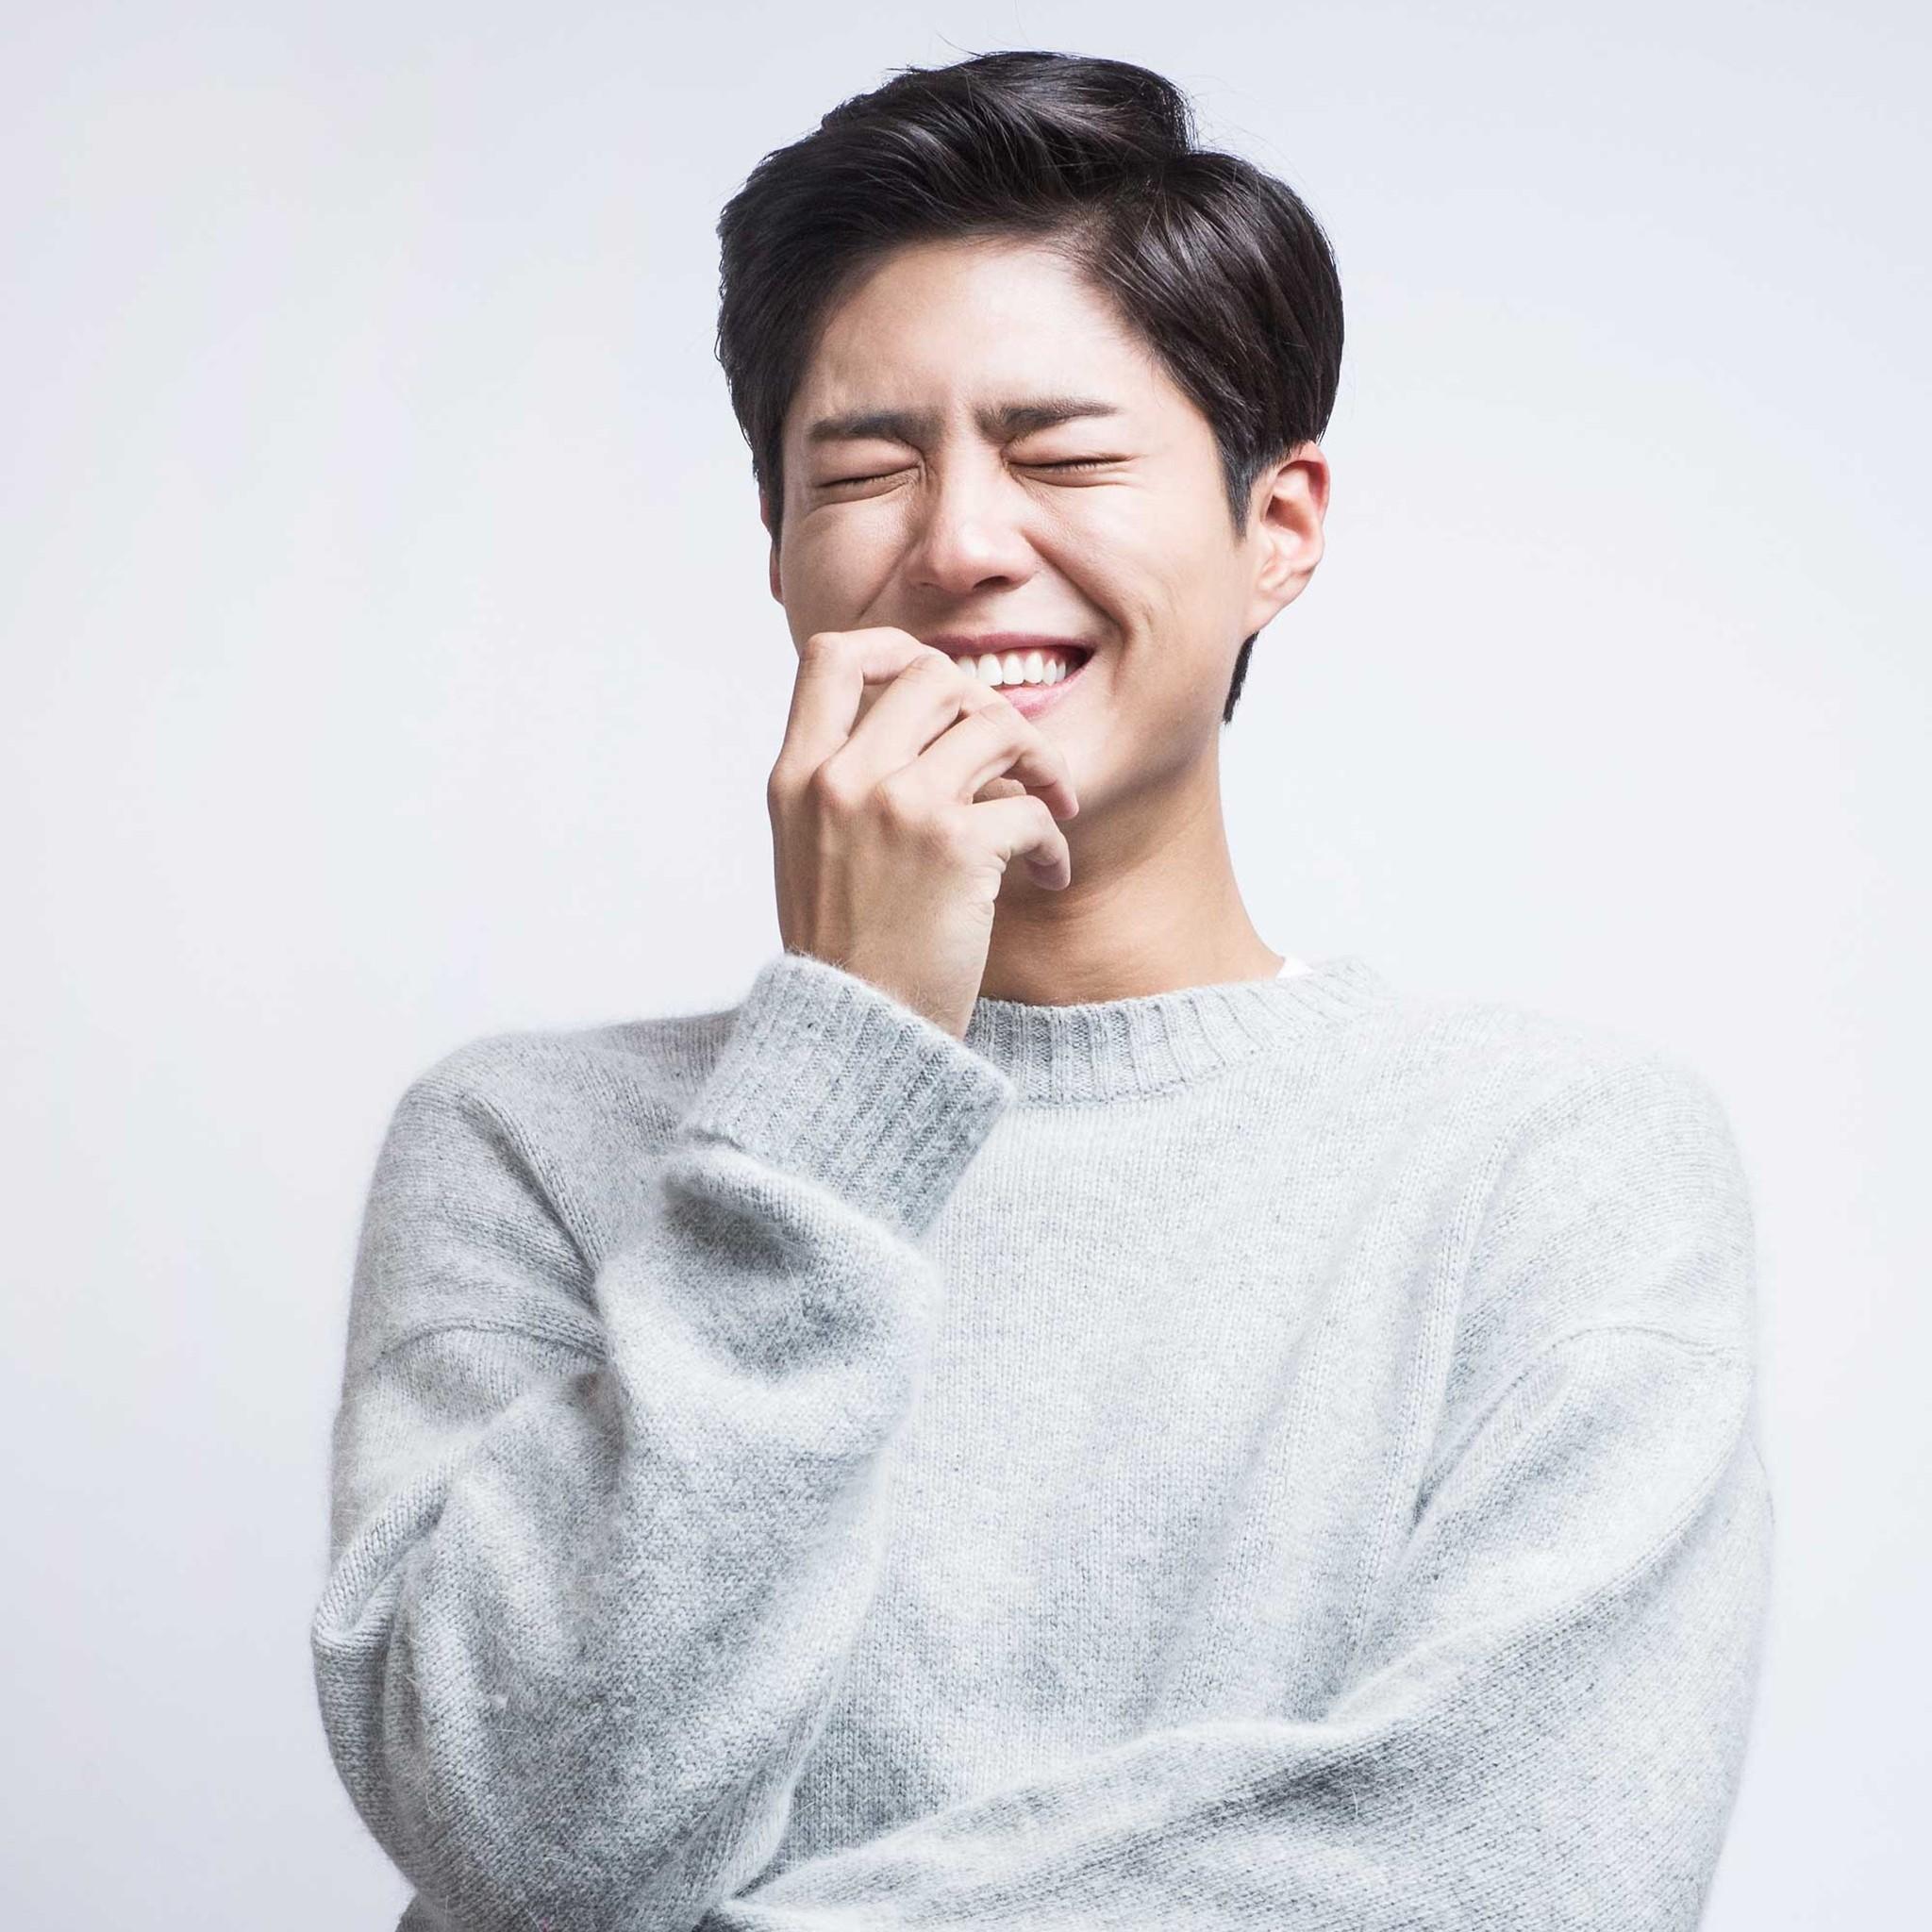 Download Park Bo Gum 2048 x 2048 Wallpapers   4681674   actors 2048x2048